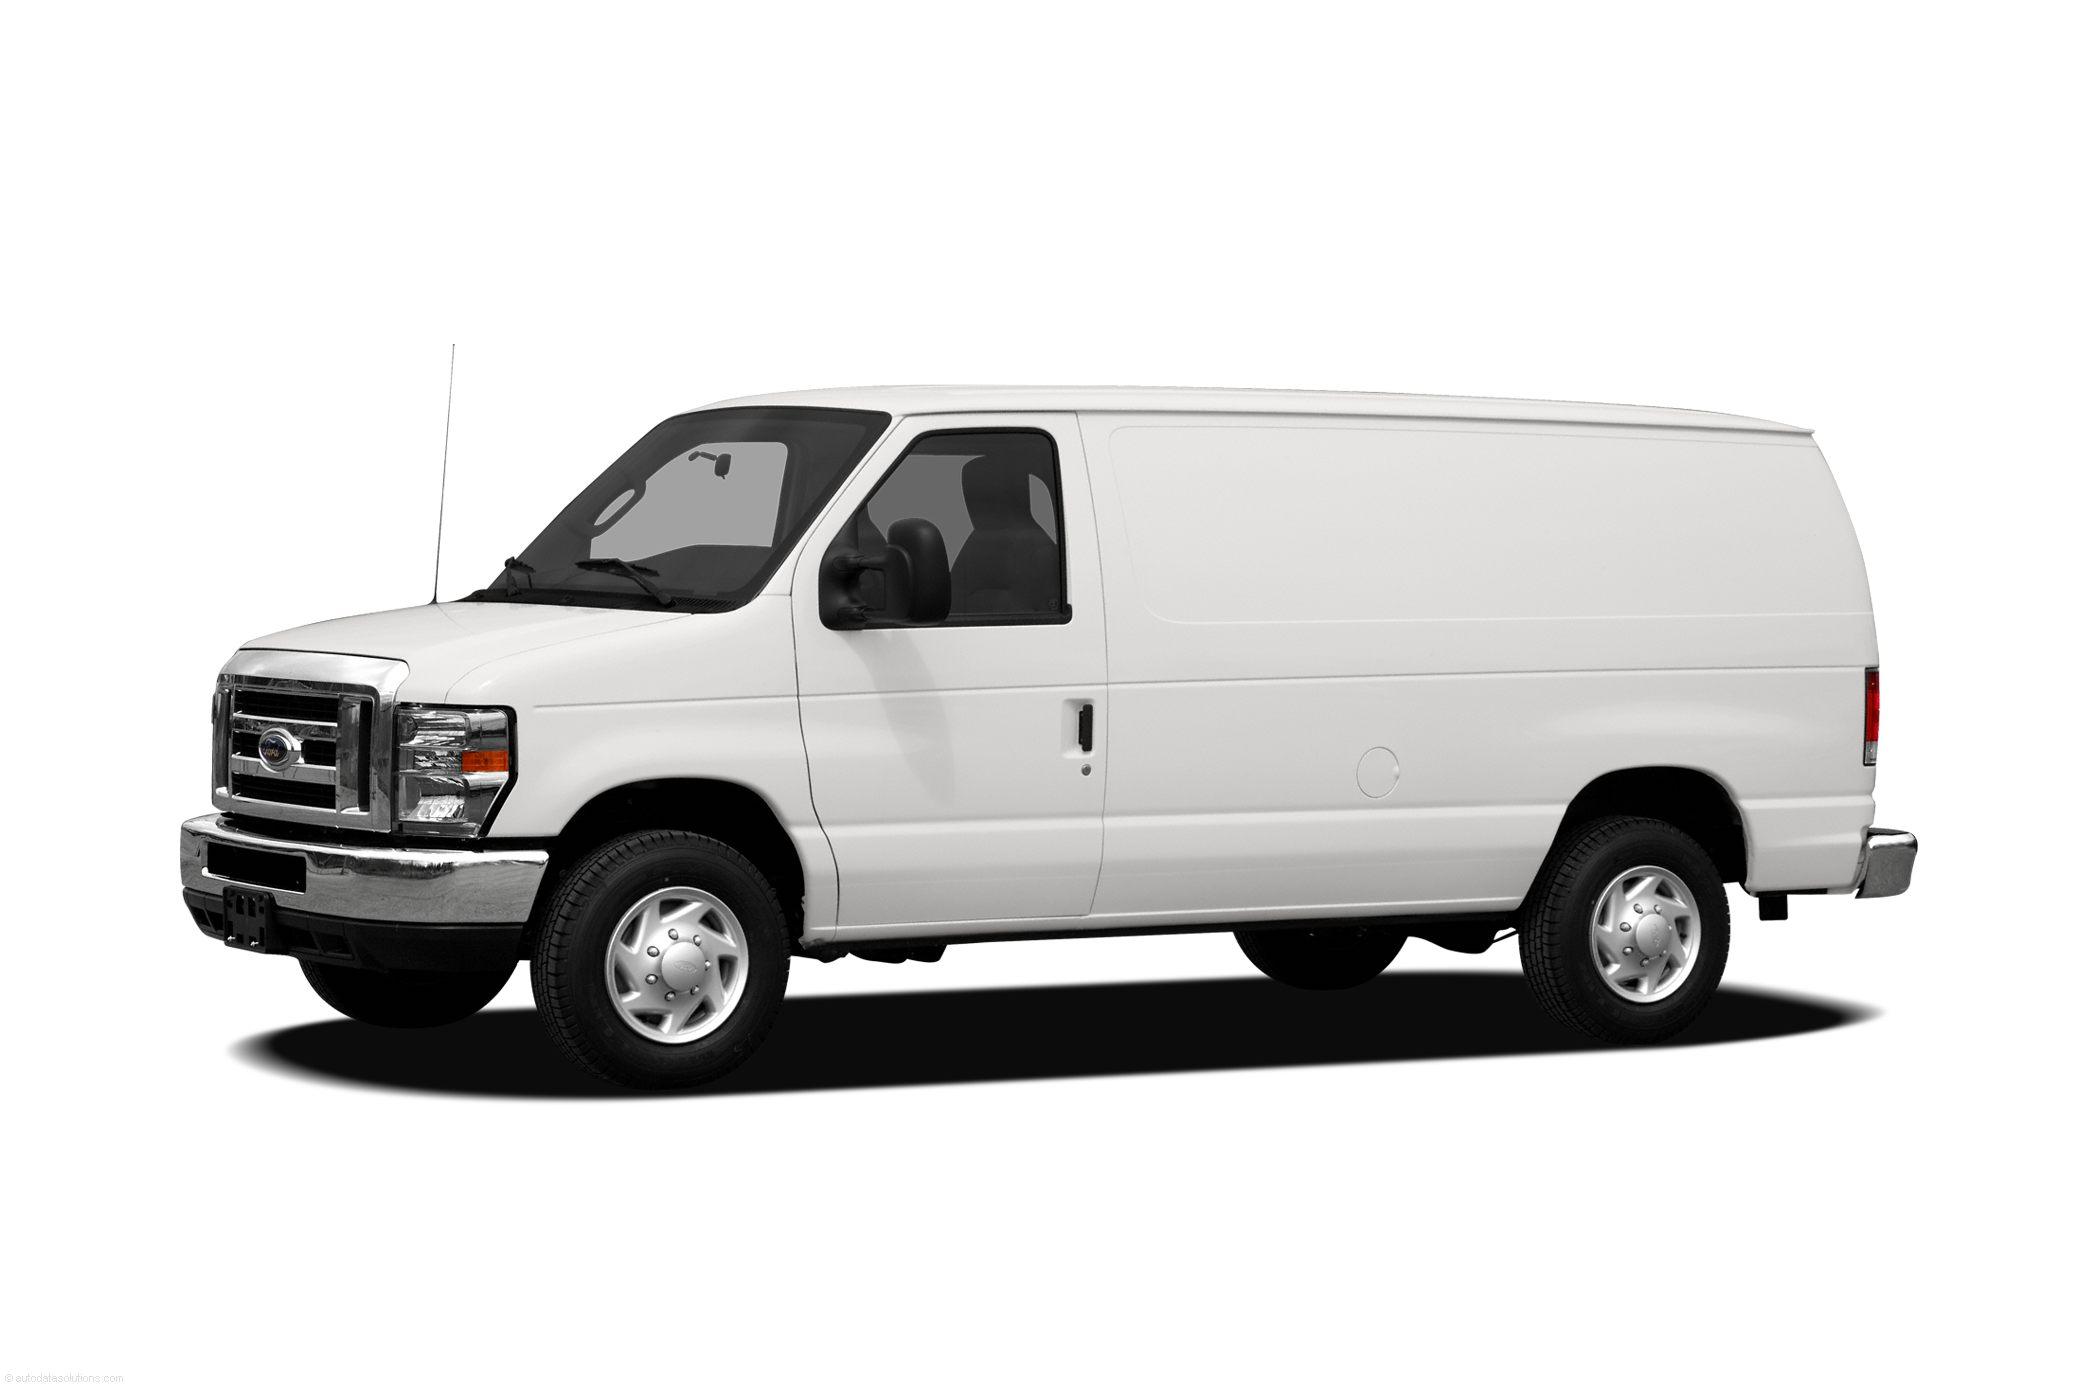 White Ford Cargo Van >> 2010 Ford Econoline E150 Cargo Van - $14,594 - North Amherst Motors